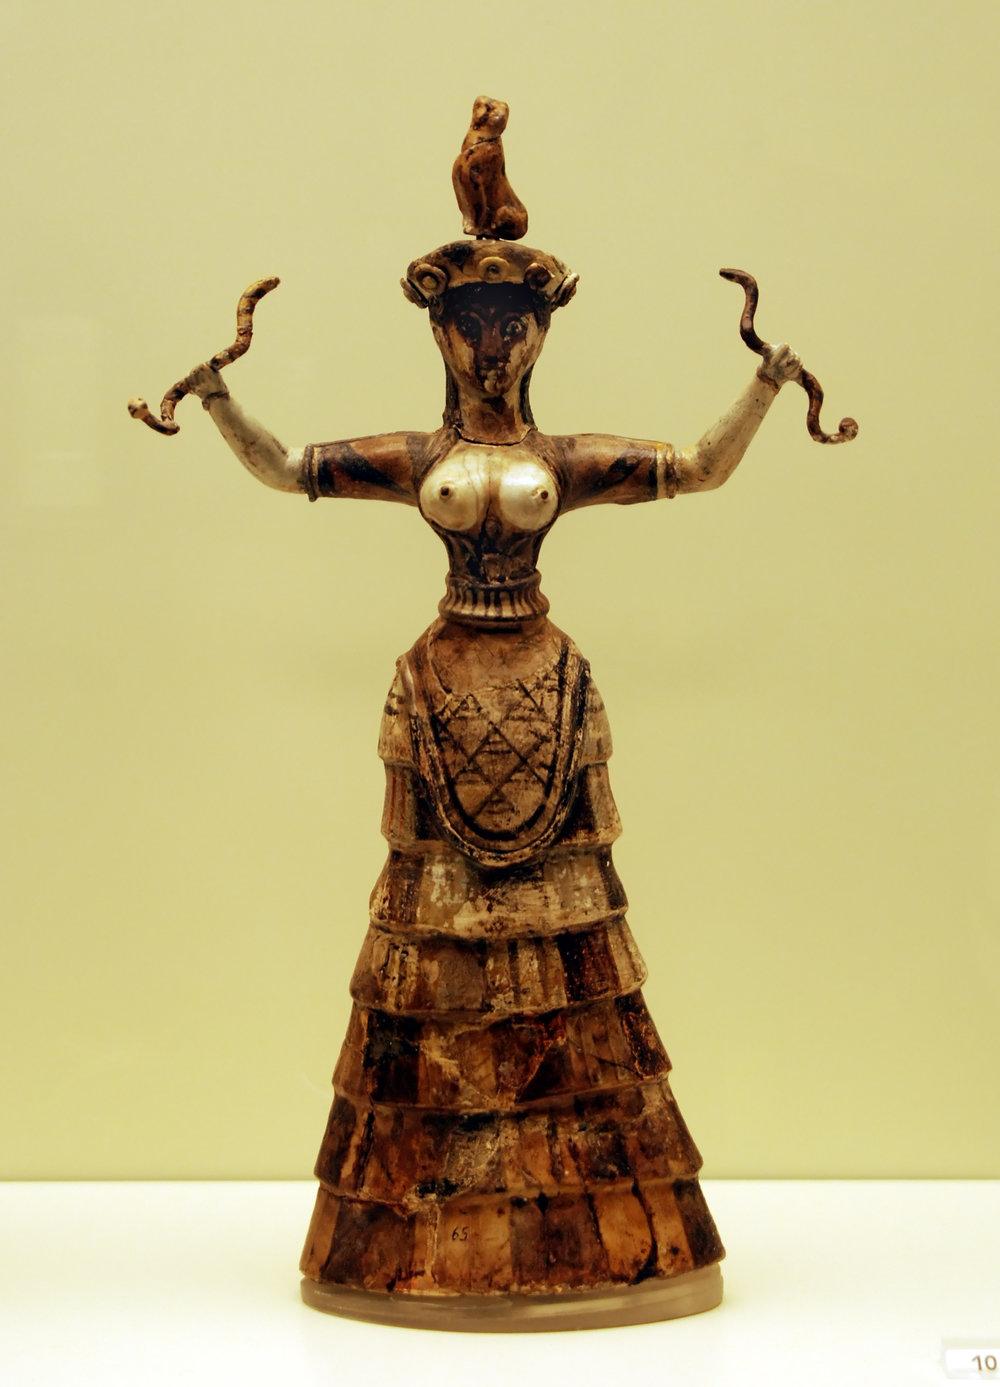 Cretian Snake Goddess. Creative CommonsAttribution 2.0 Genericlicense.